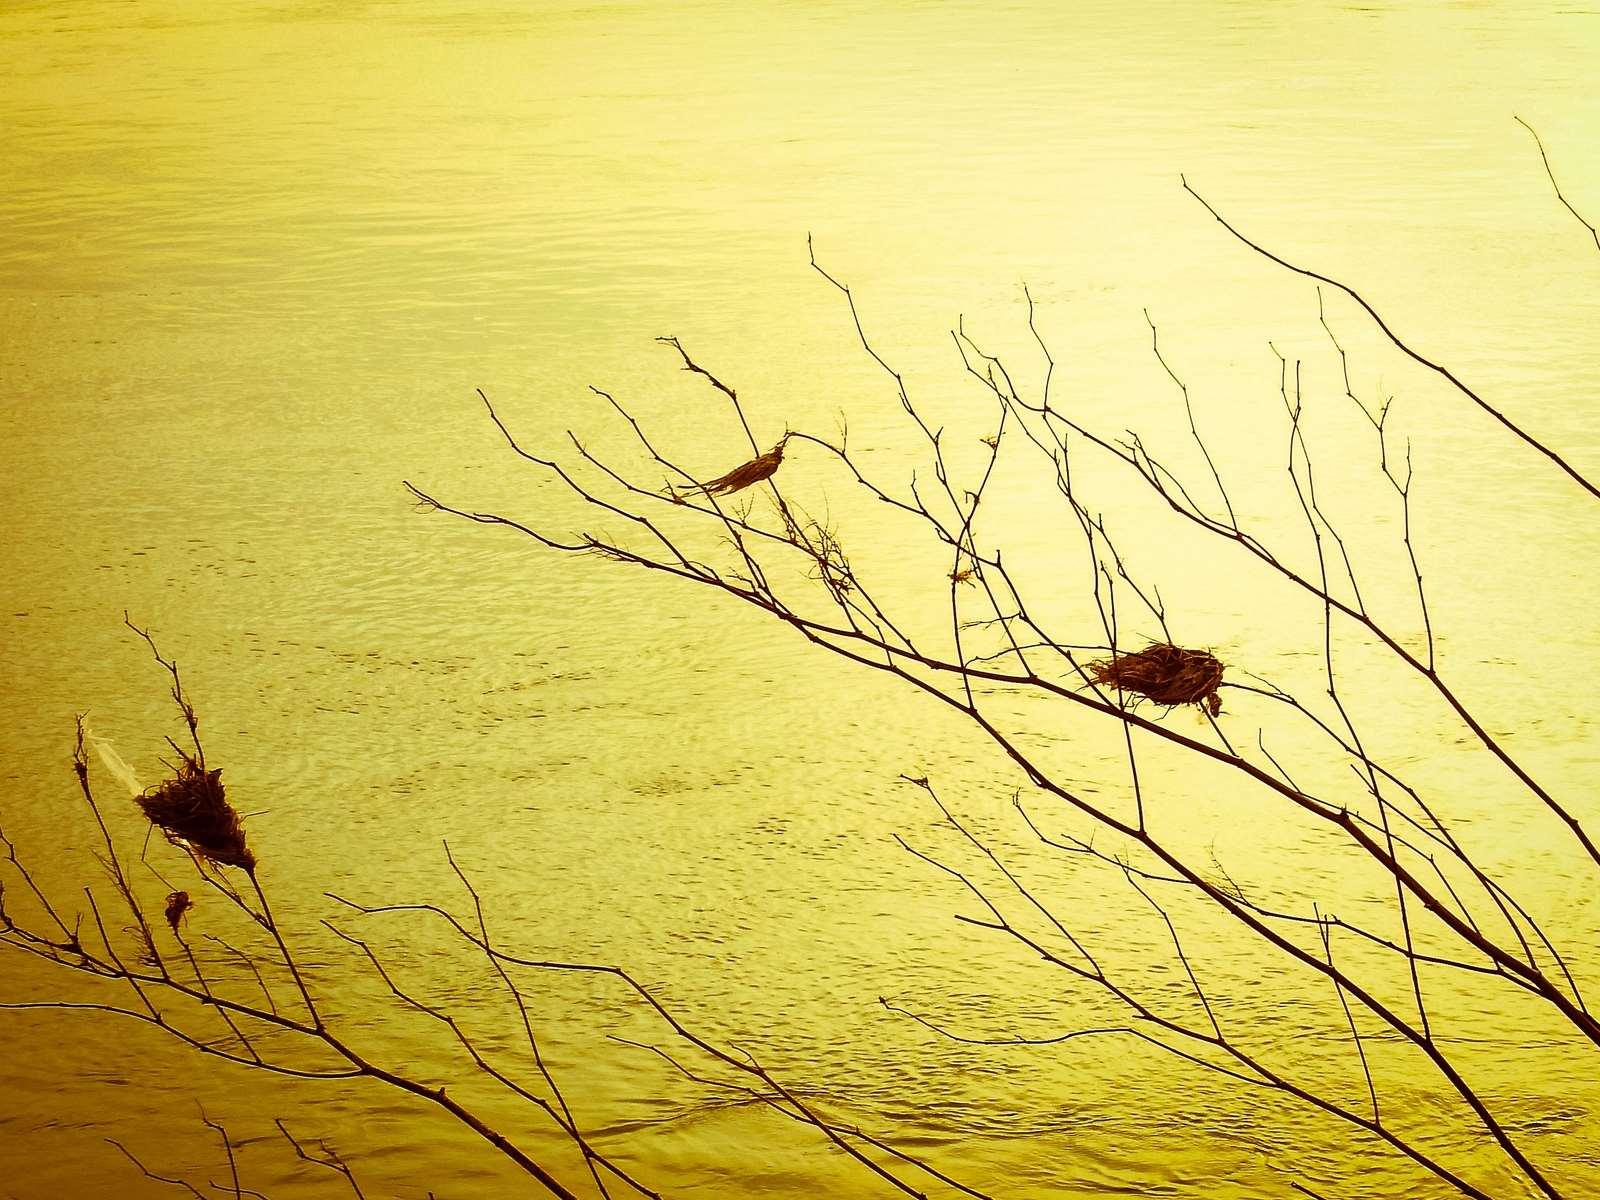 Leaf birds at the evening river